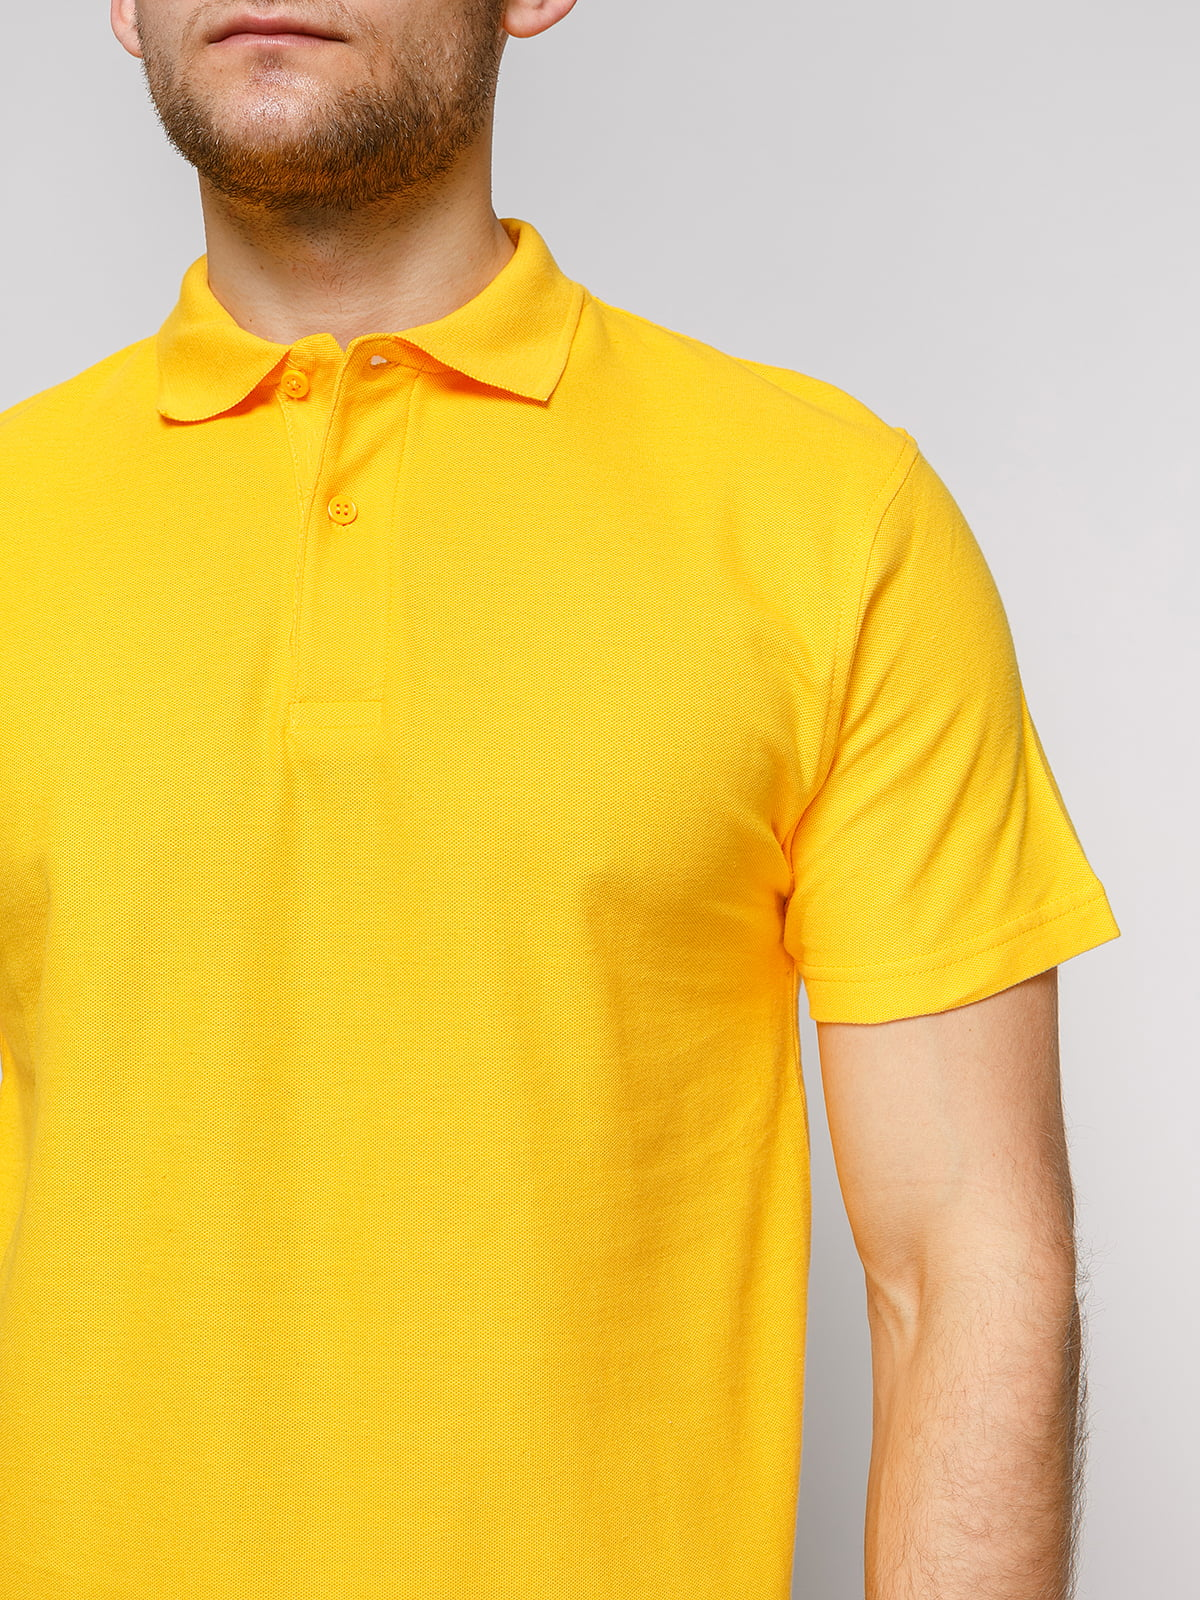 Футболка-поло жовта | 4812196 | фото 3